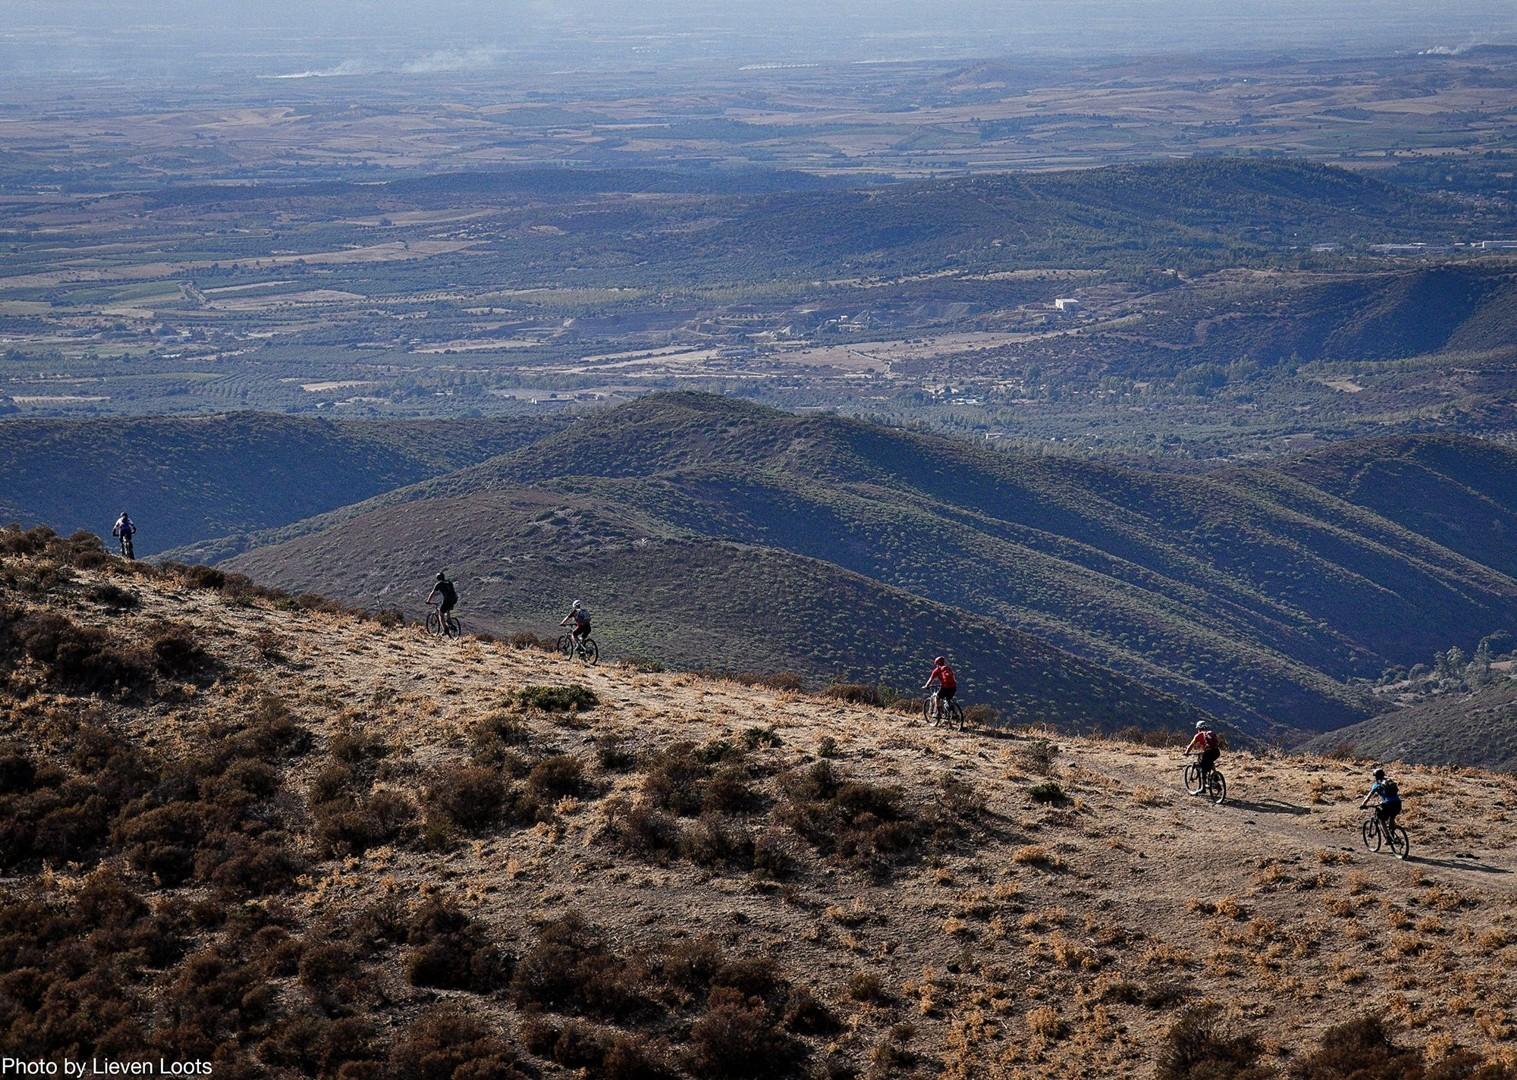 mountain-bike-holiday-in-sardinia-traverse.jpg - Sardinia - Sardinia Traverse - Guided Mountain Bike Holiday - Mountain Biking